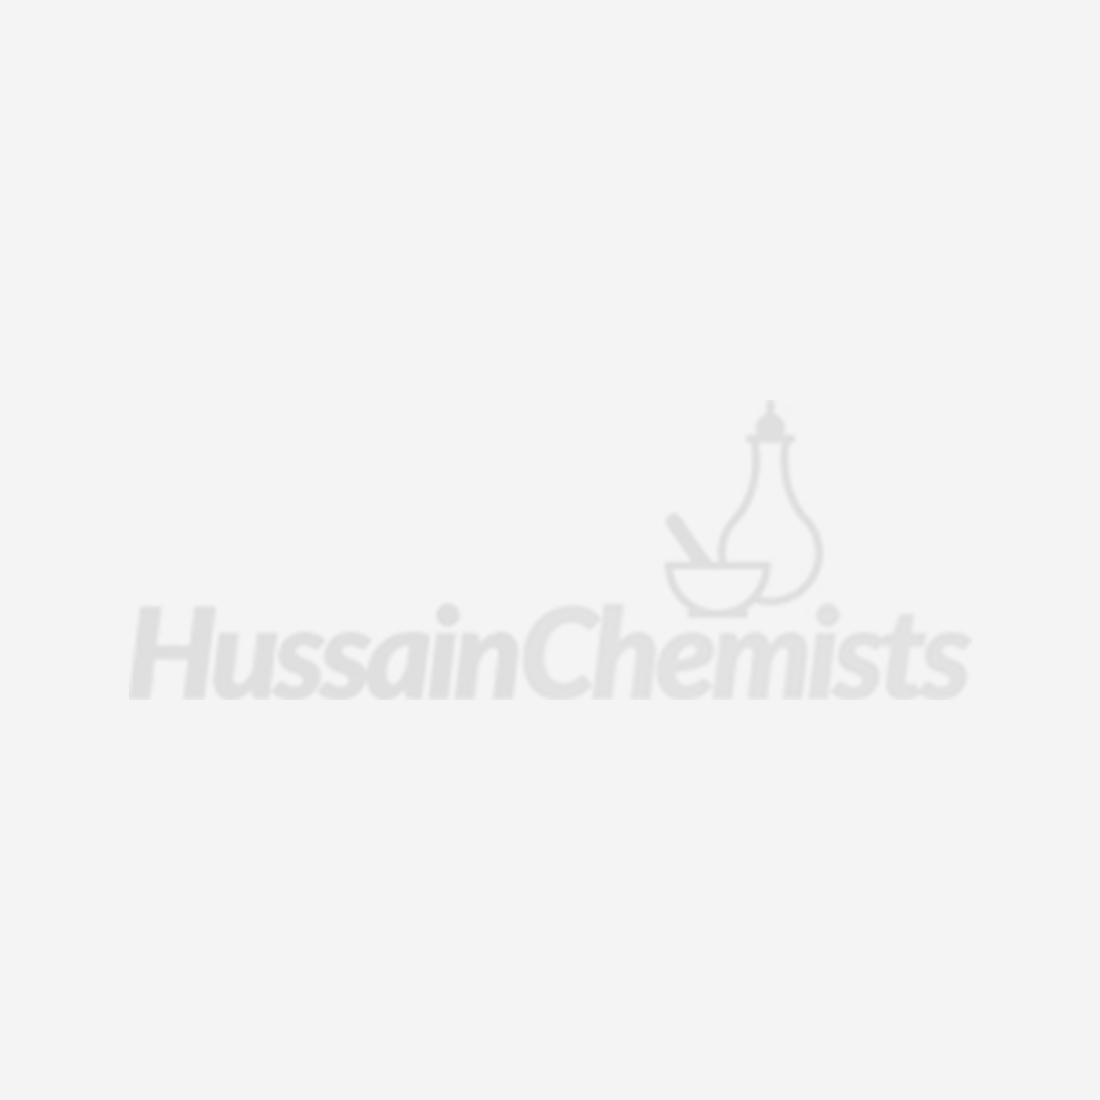 Covonia Dry Cough Sugar Free Formula 150 ml